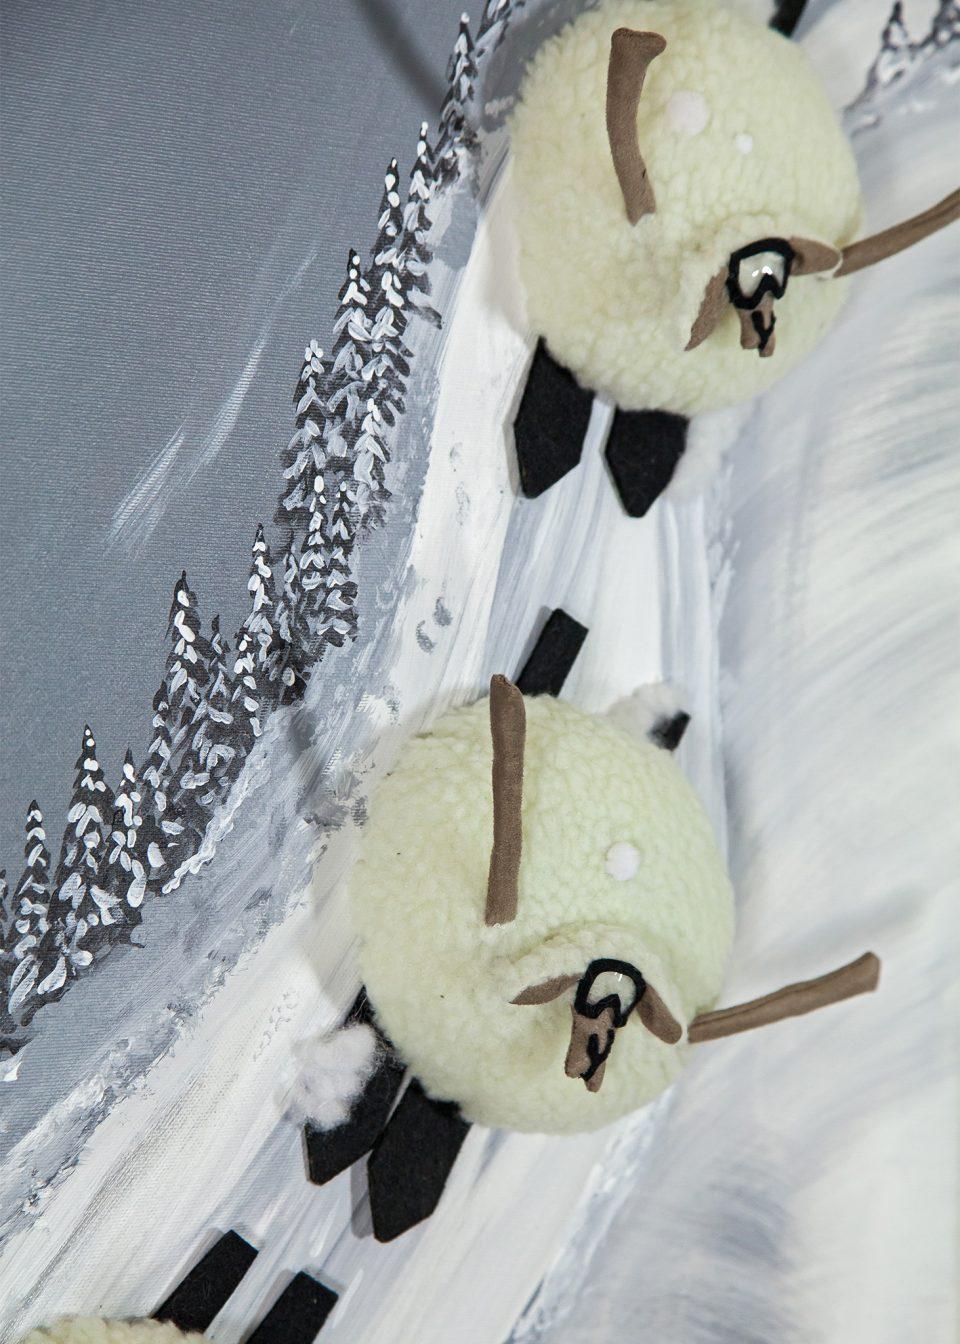 Descente des skieurs